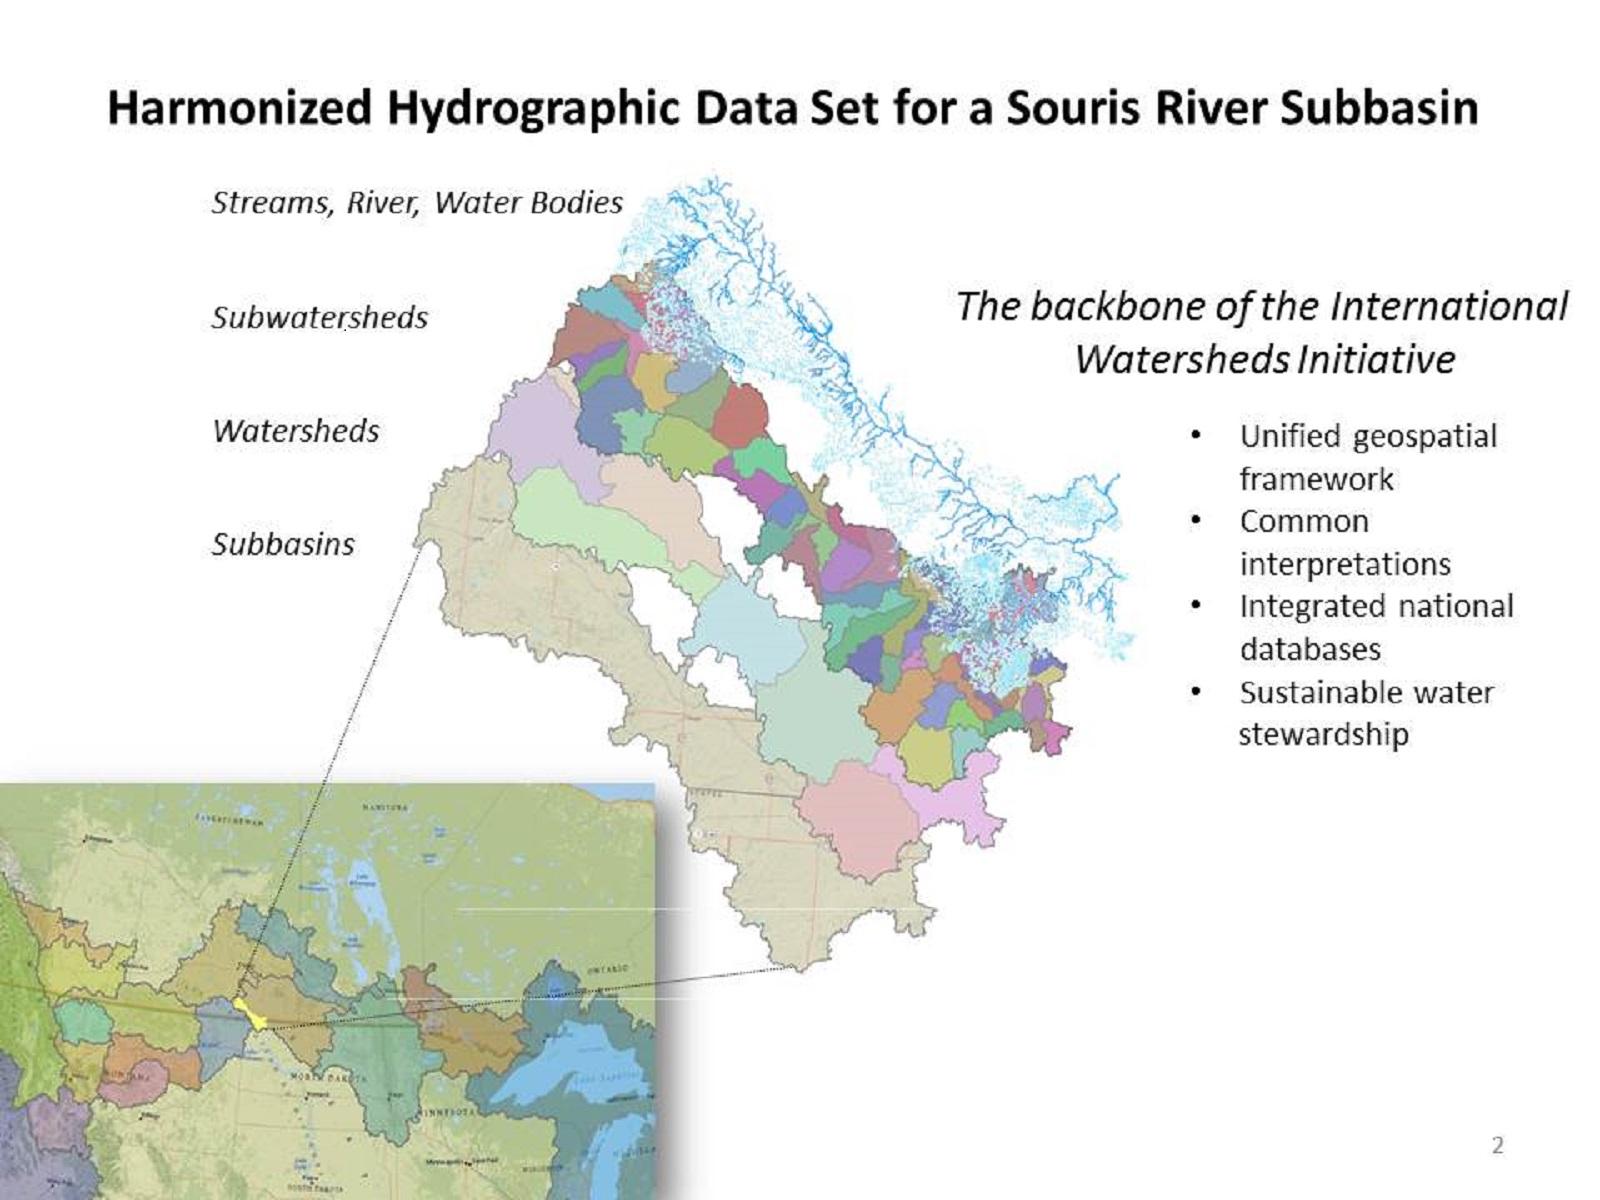 Data Harmonization in the Souris River Basin